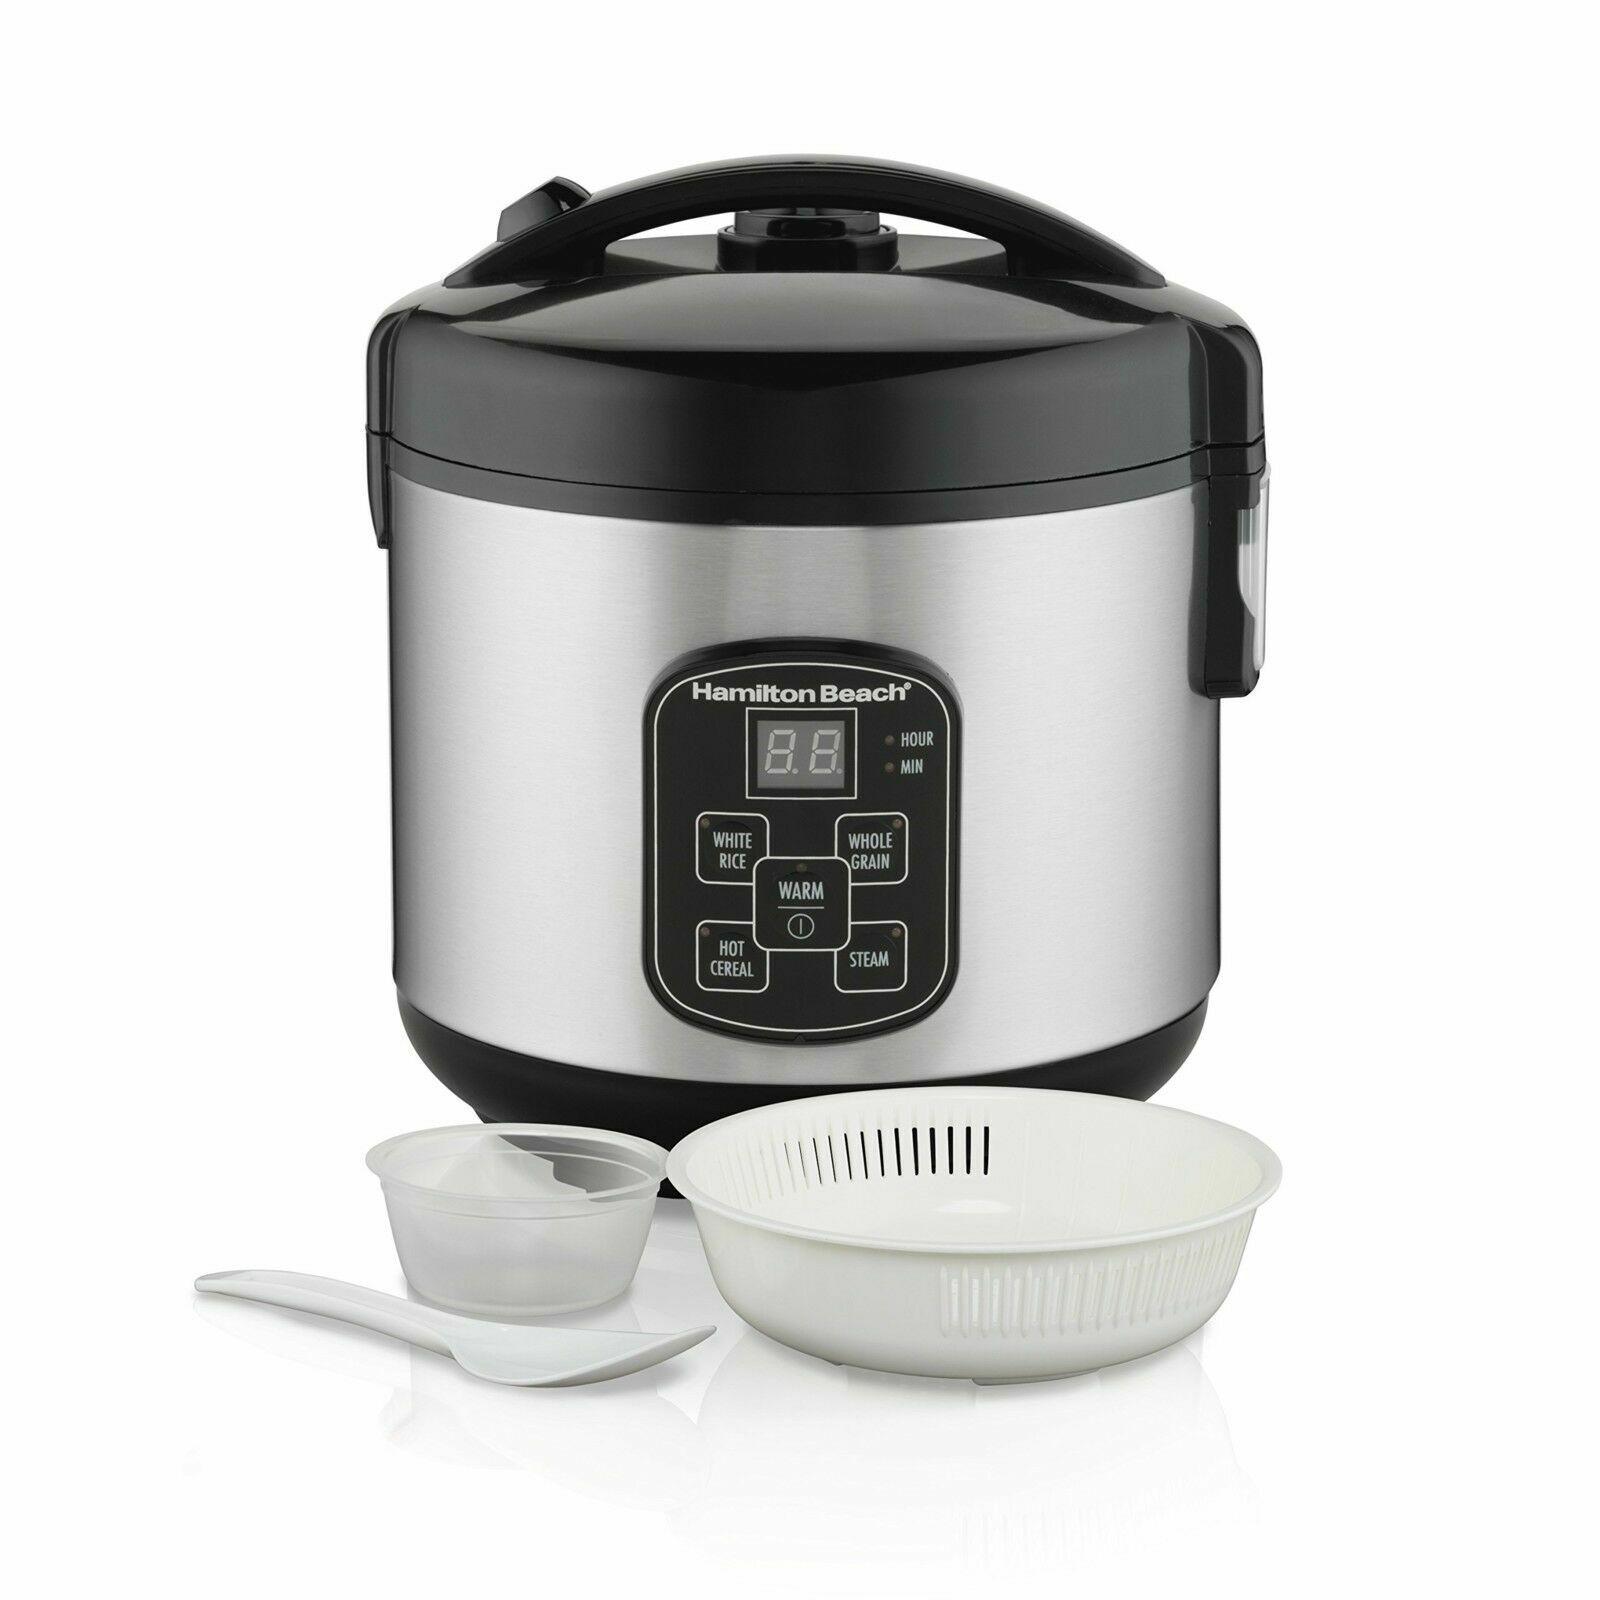 Hamilton Beach Digital Programmable Rice Cooker & Food Steam